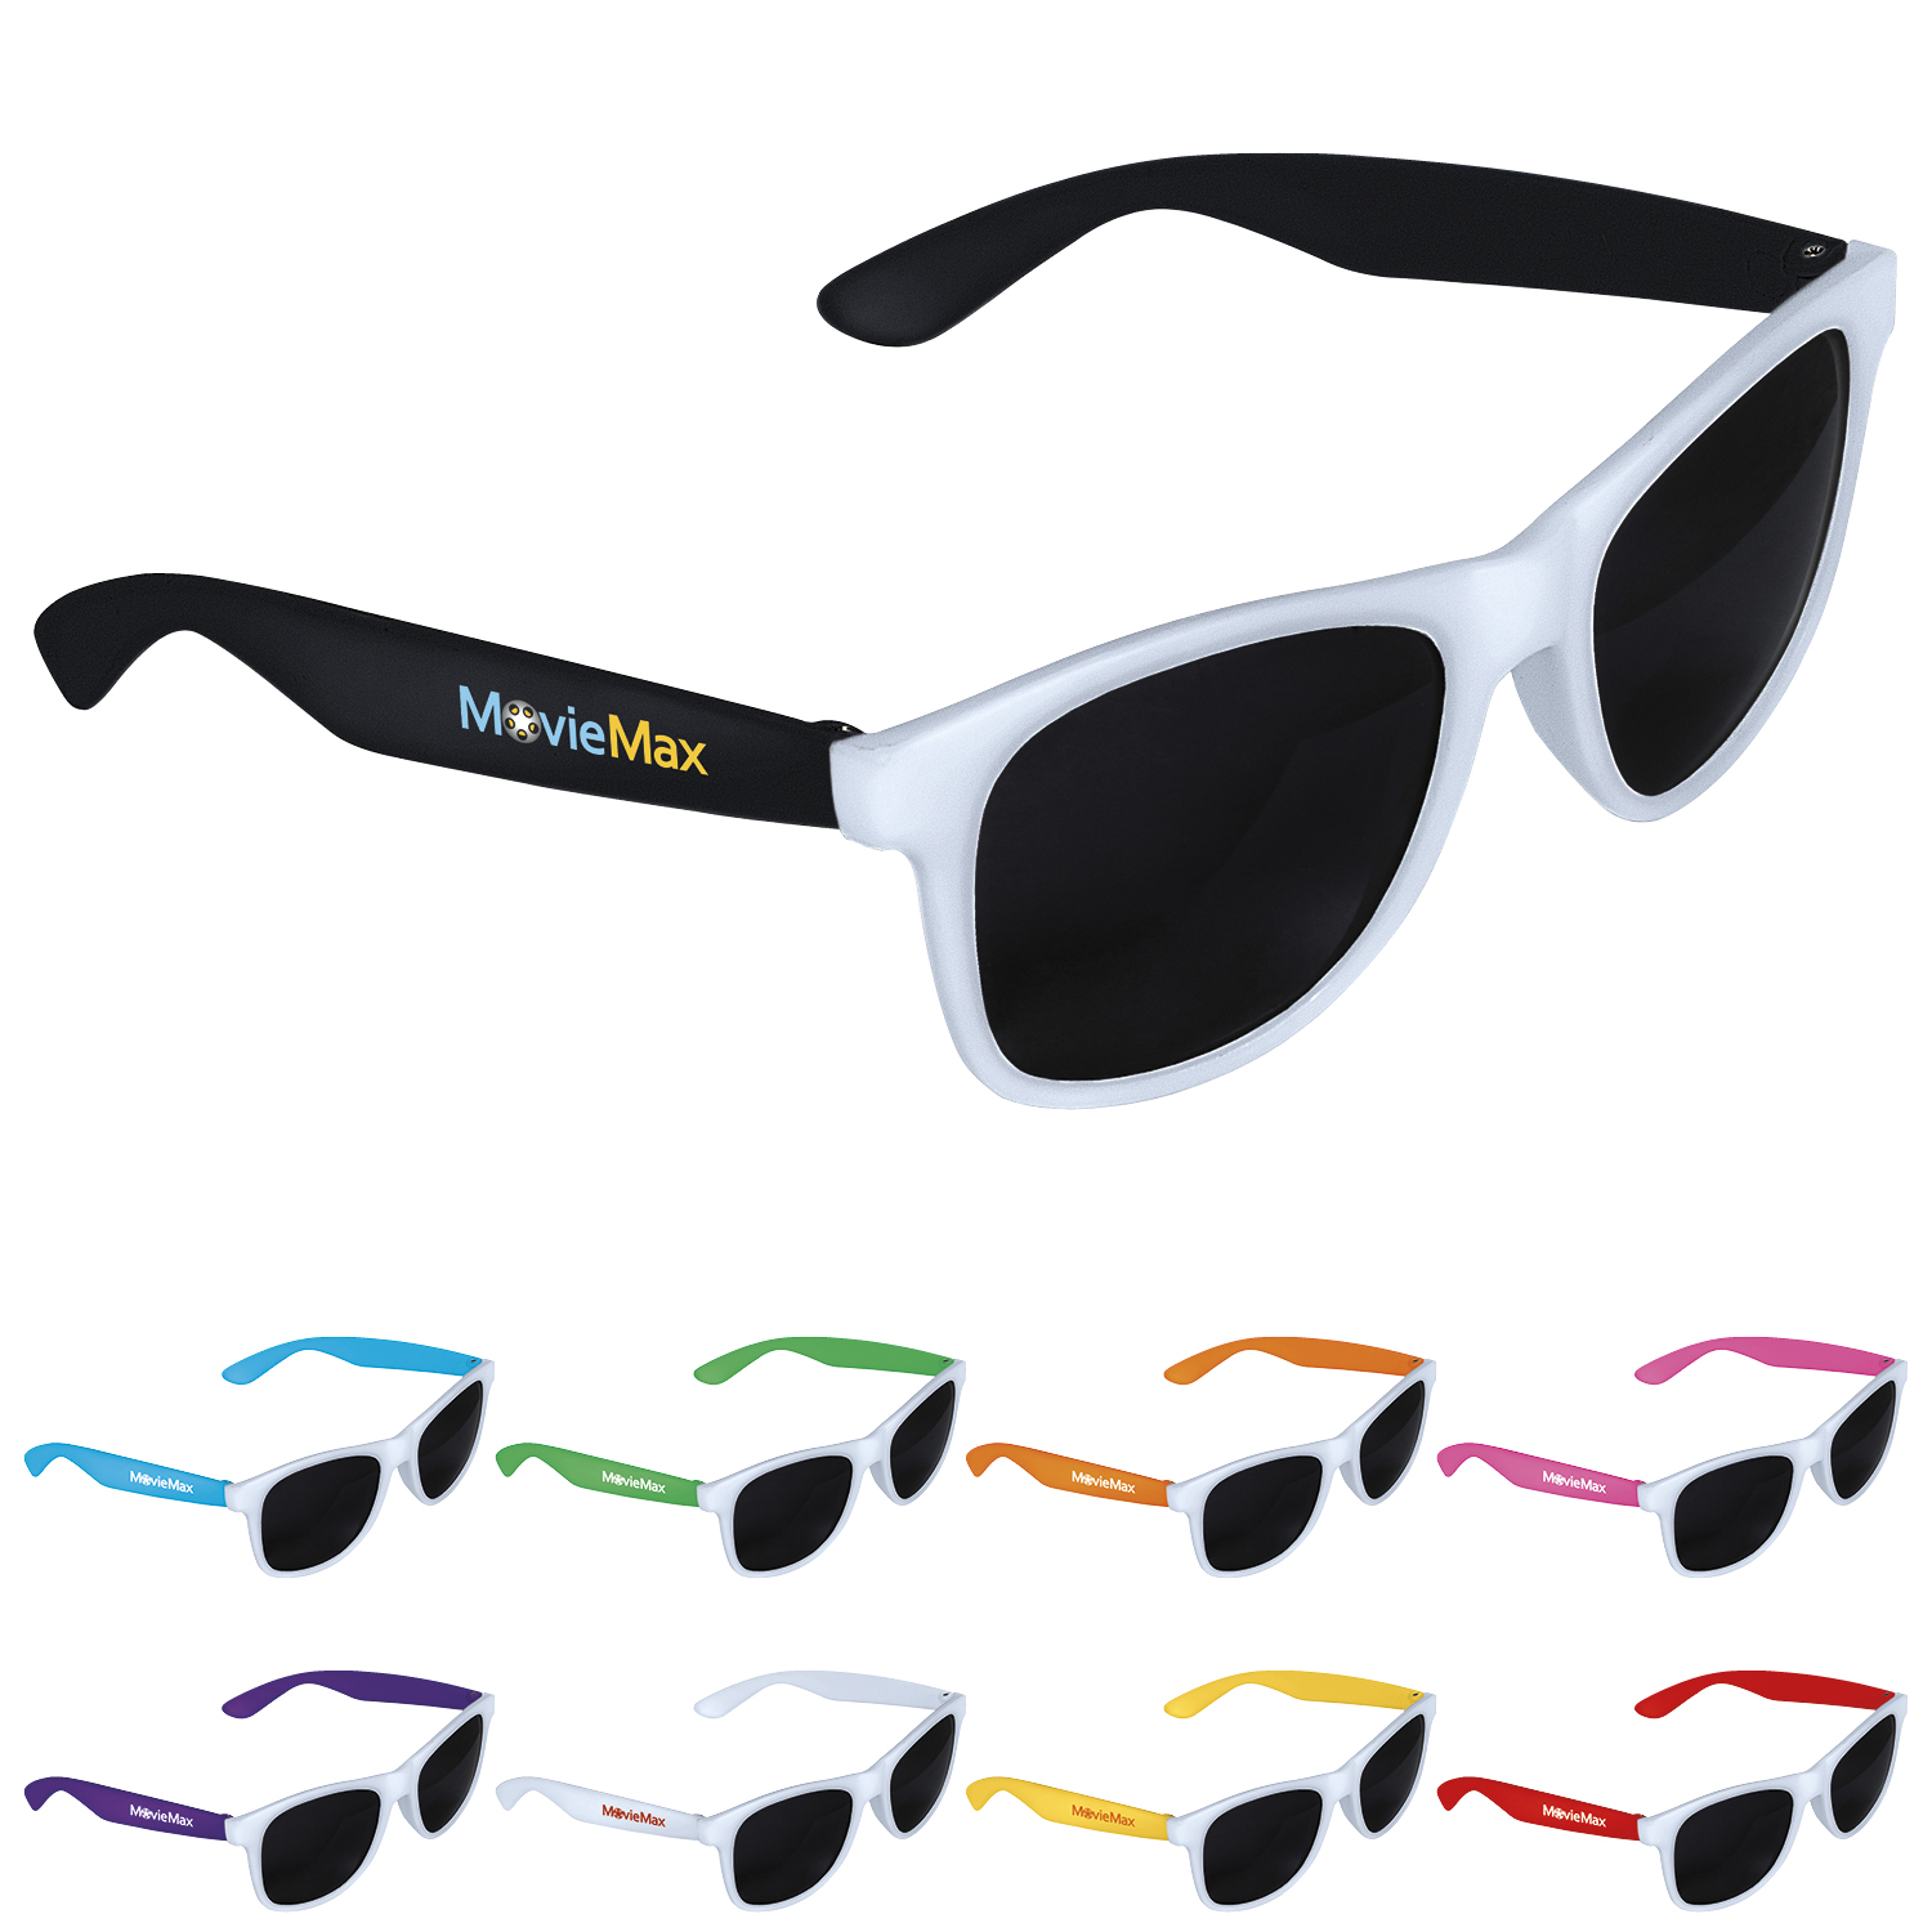 GoodValue 2 Tone White Frame Sunglasses, #26046, 1 Colour Imprint